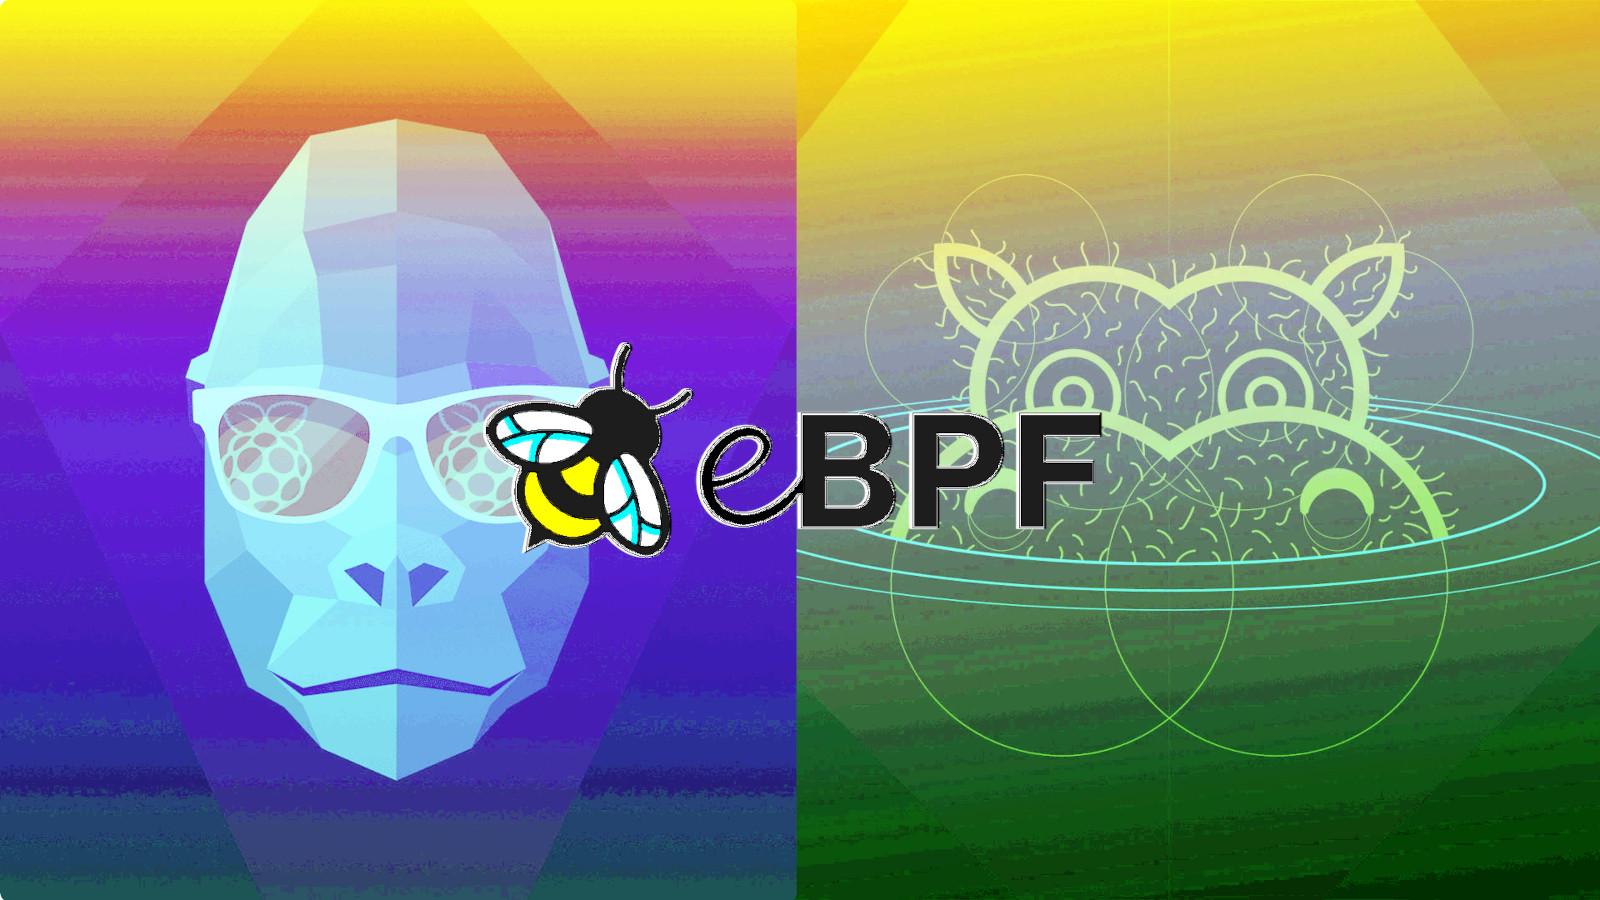 Linux eBPF bug gets root privileges on Ubuntu - Exploit released